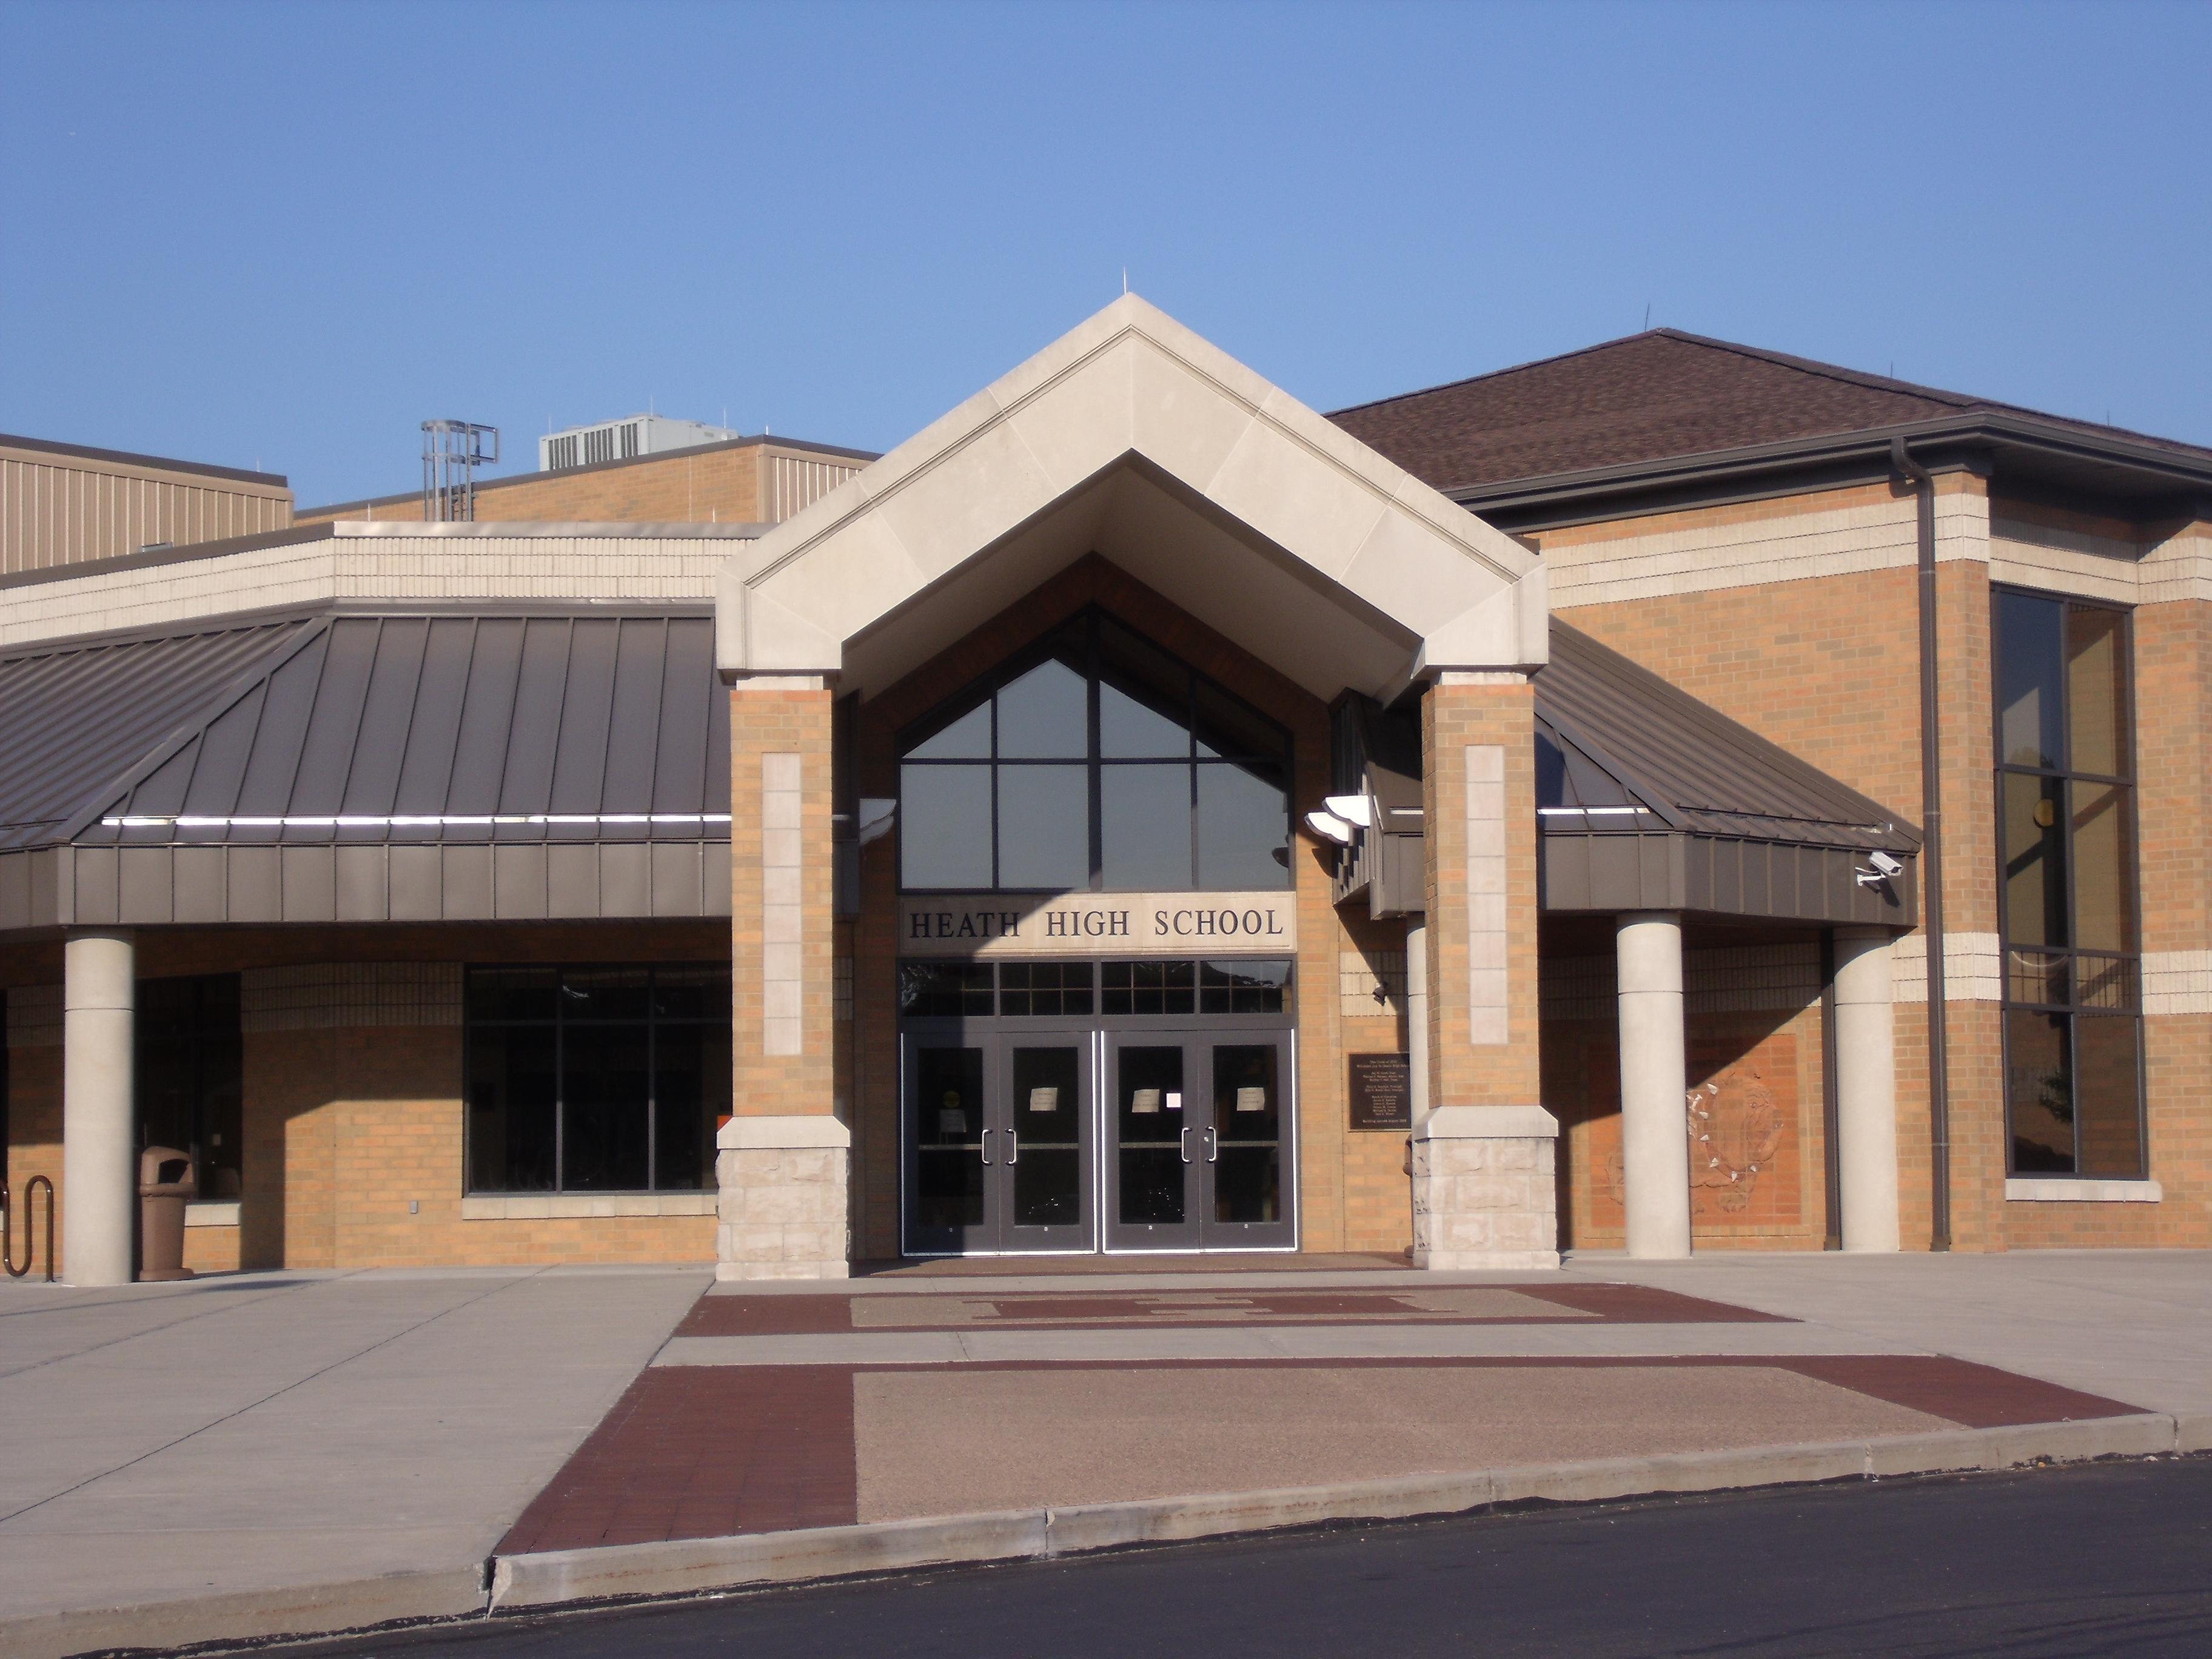 Heath High School (Ohio) - Wikipedia